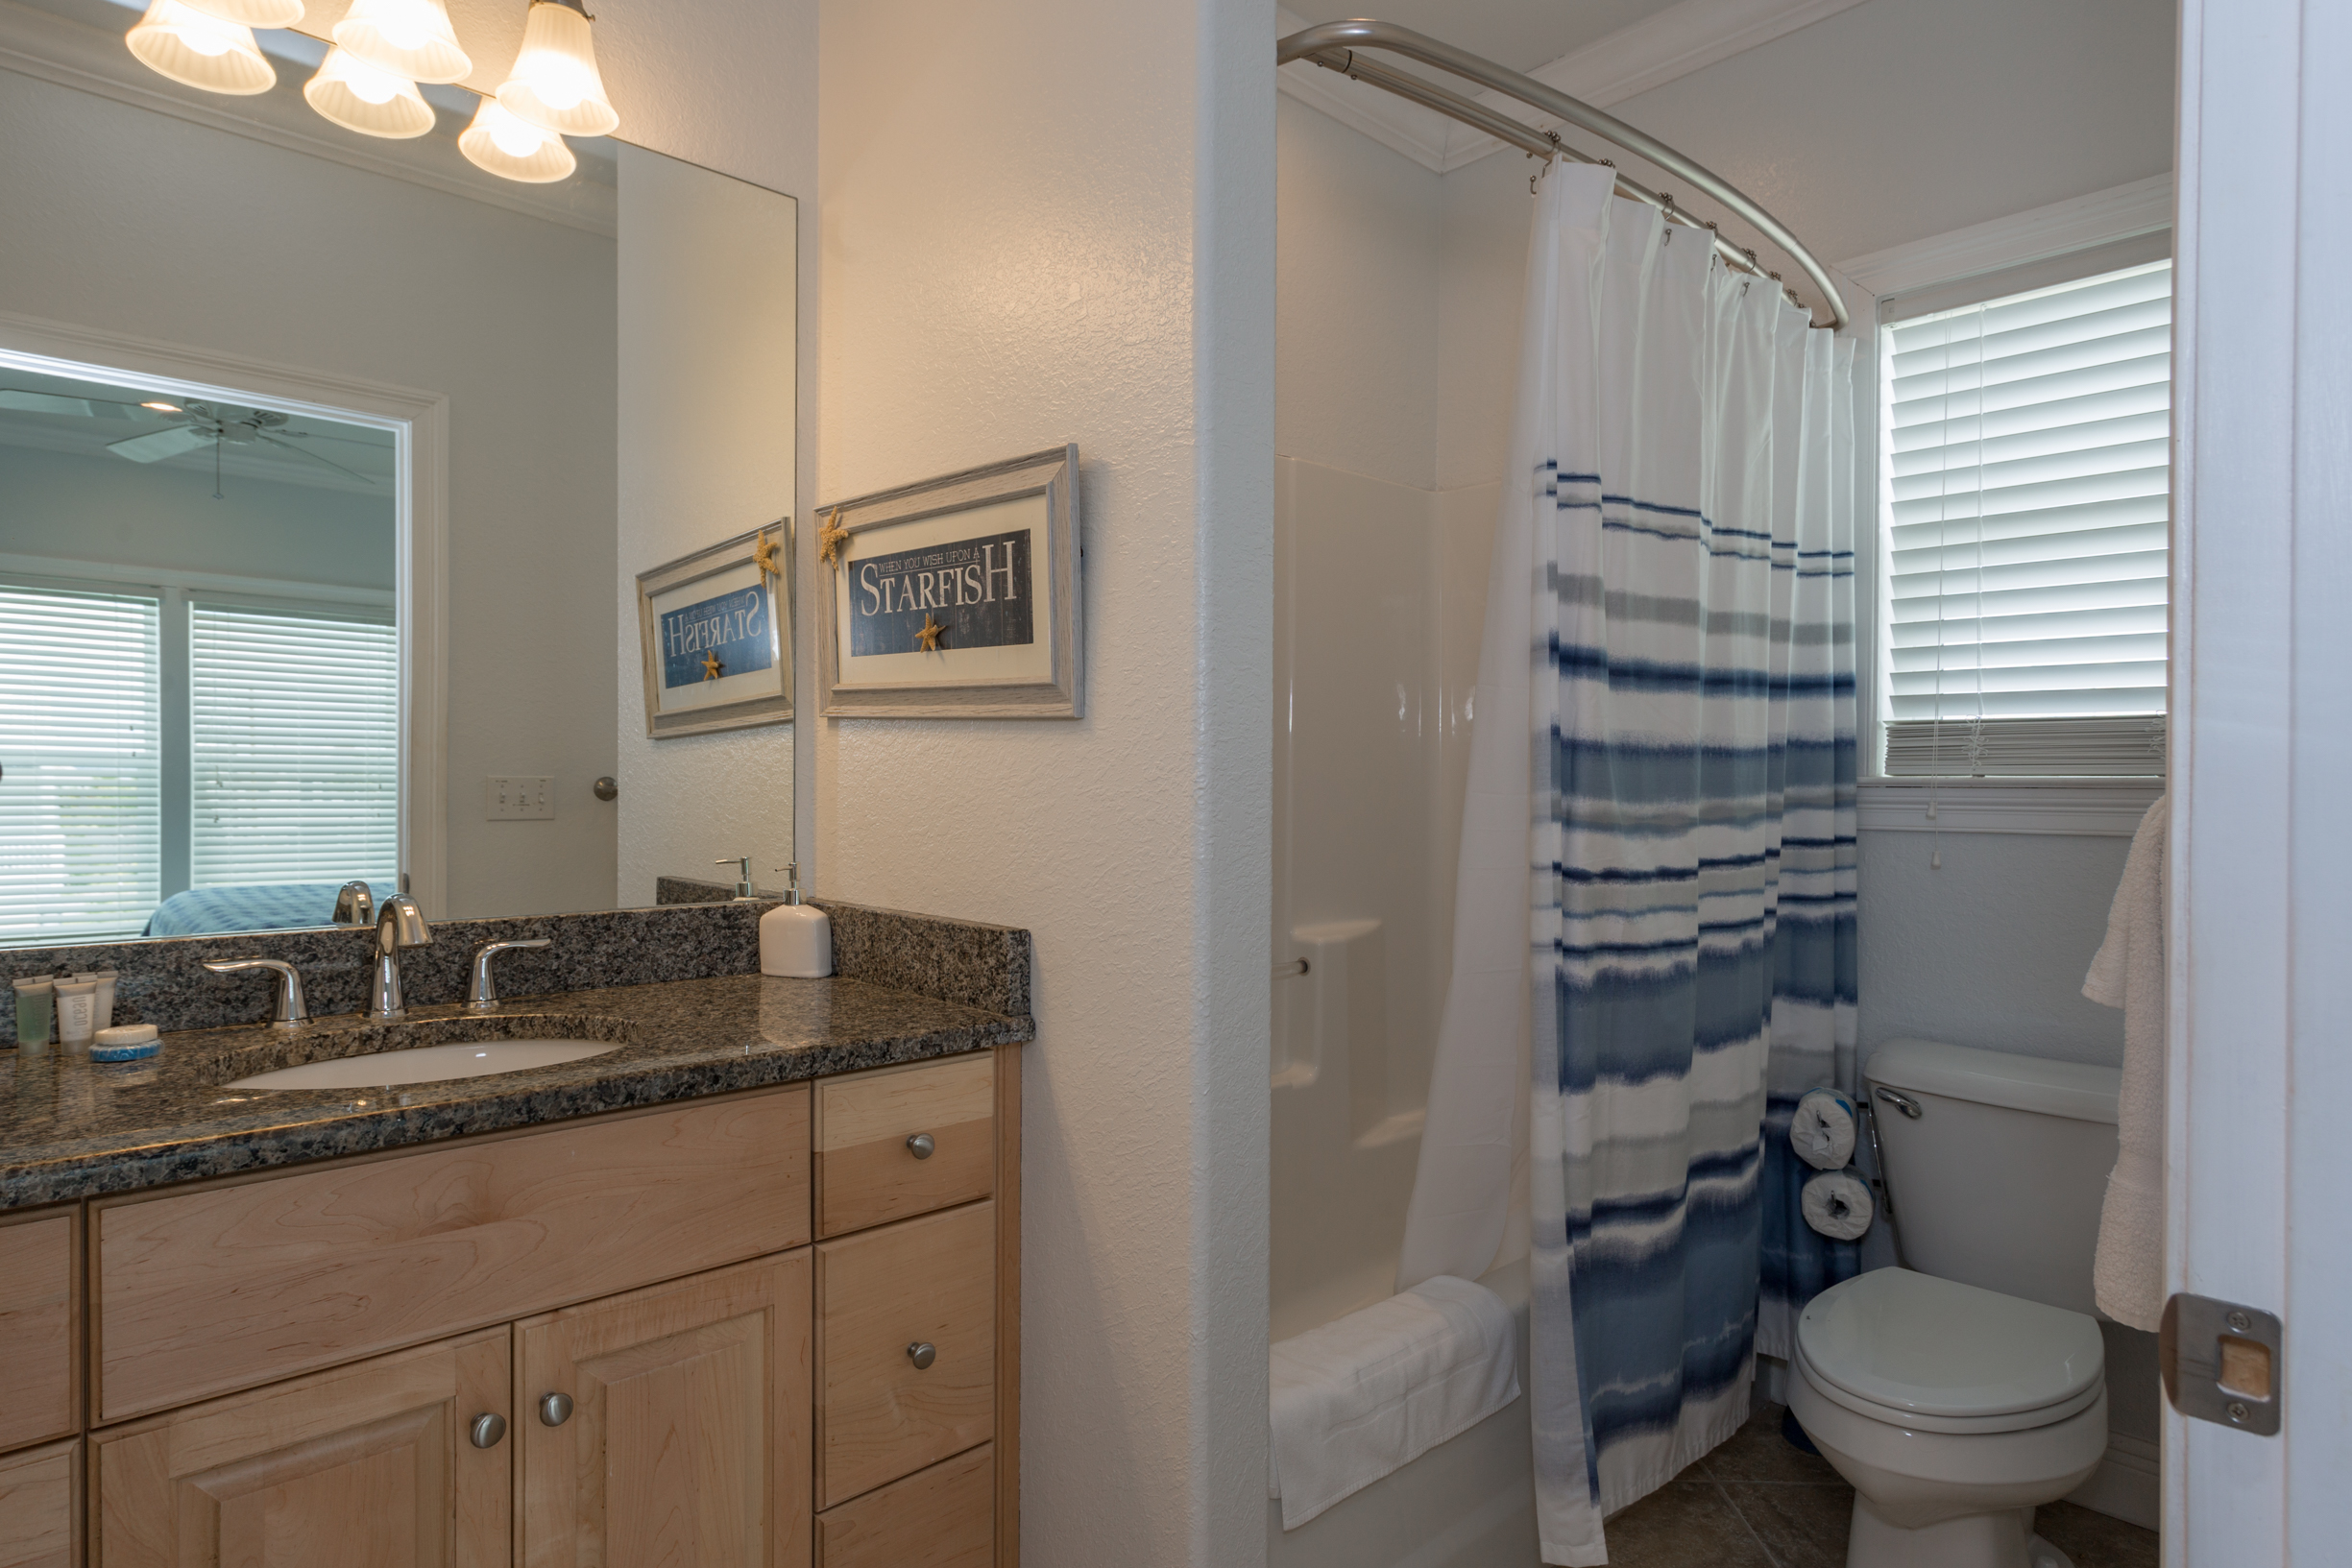 Ariola 1003 - The Starfish House House/Cottage rental in Pensacola Beach House Rentals in Pensacola Beach Florida - #54